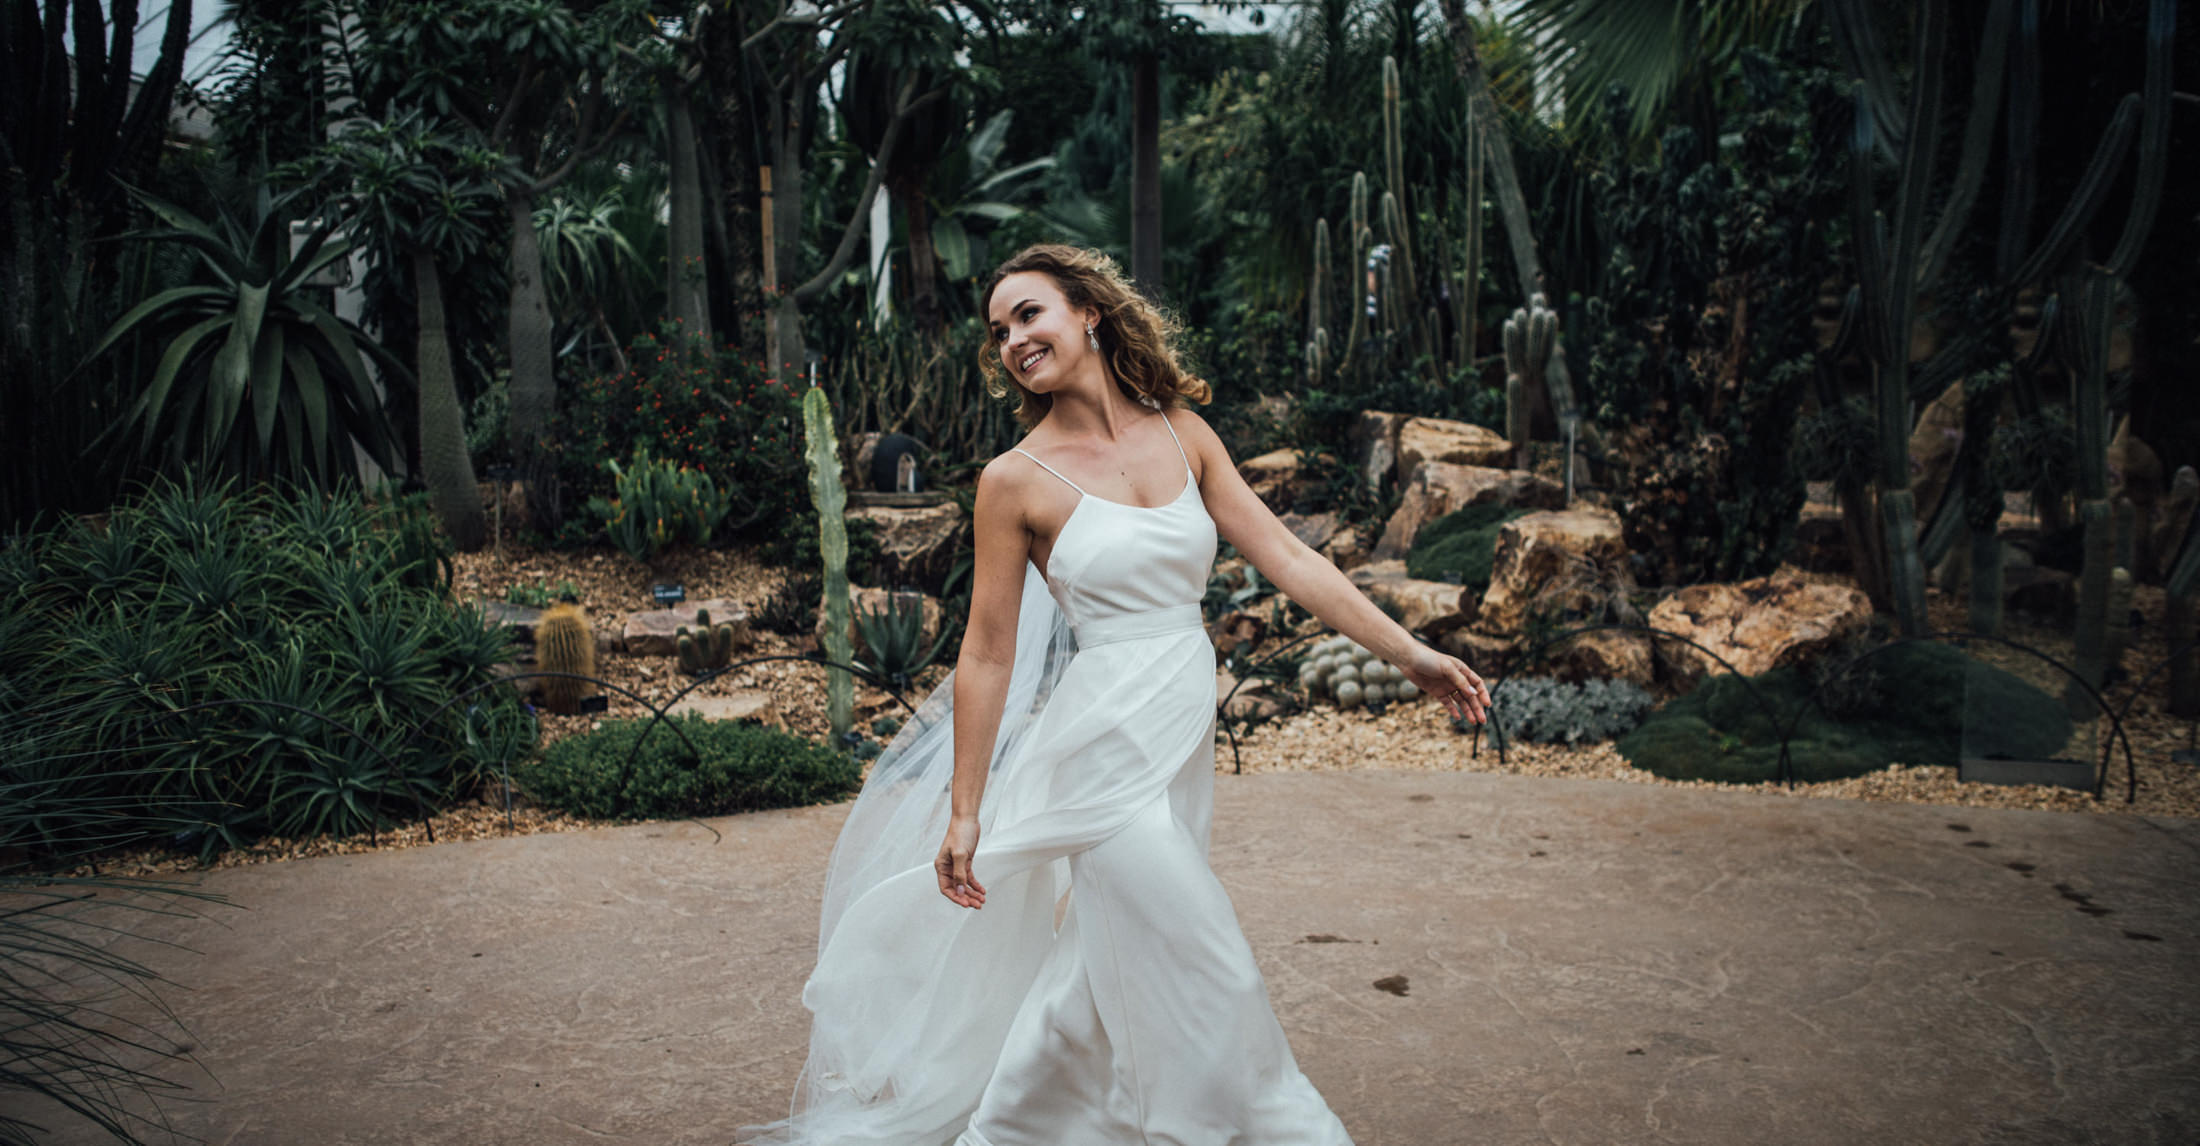 RHS Wisley wedding photography | Surrey wedding photographer